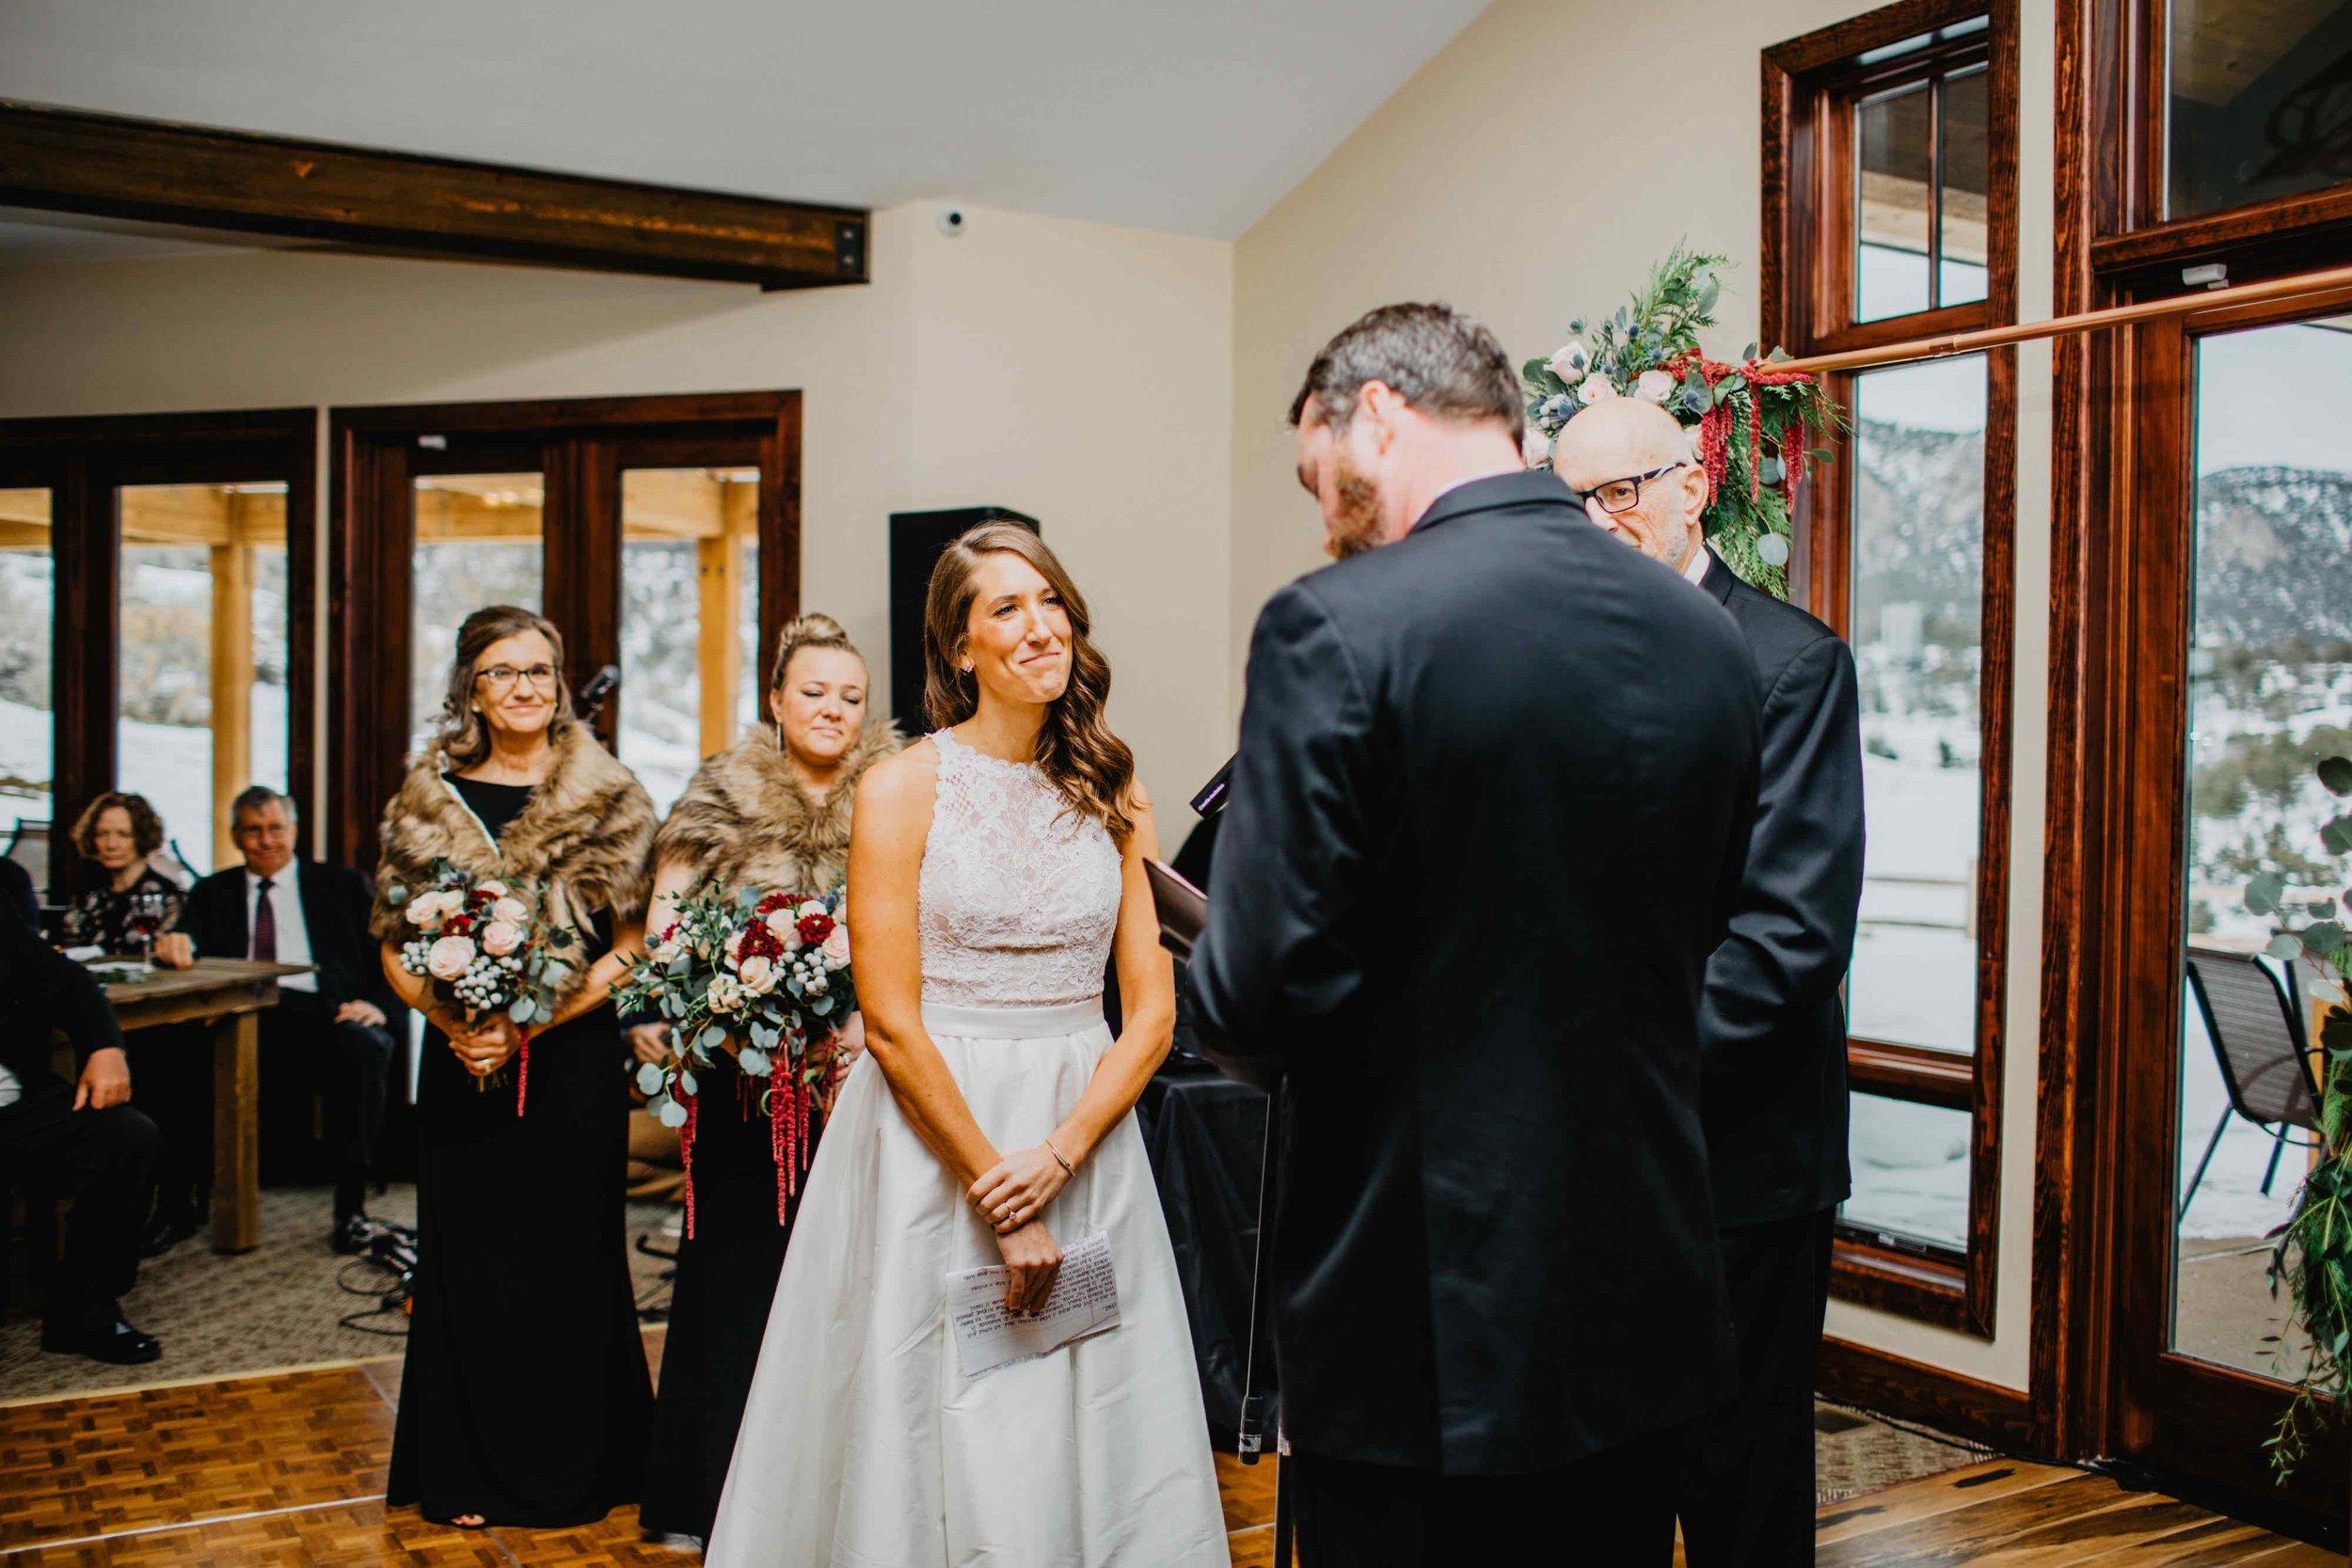 Kisa Conrad Favorites-0004-colorado-wedding-photographer-denver-springs-vailhotel-glenwood-springs-colorado-wedding-photographer.jpeg